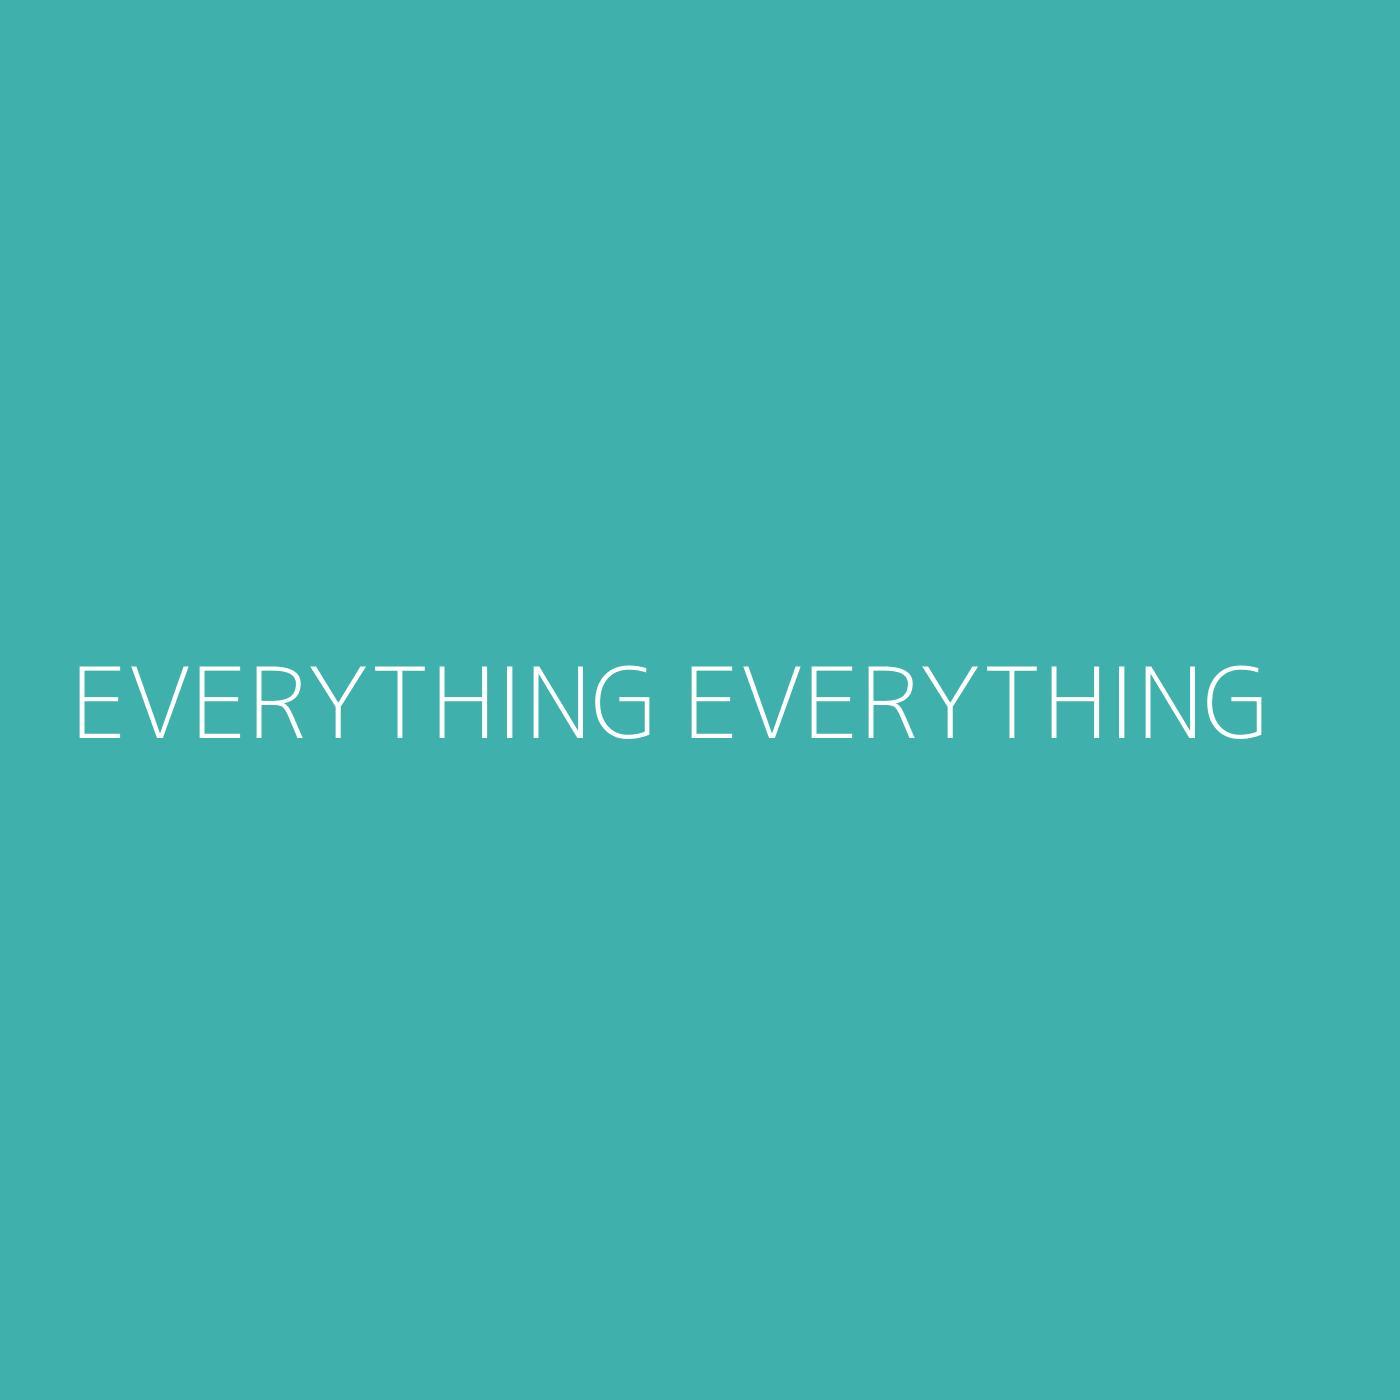 Everything Everything Playlist Artwork